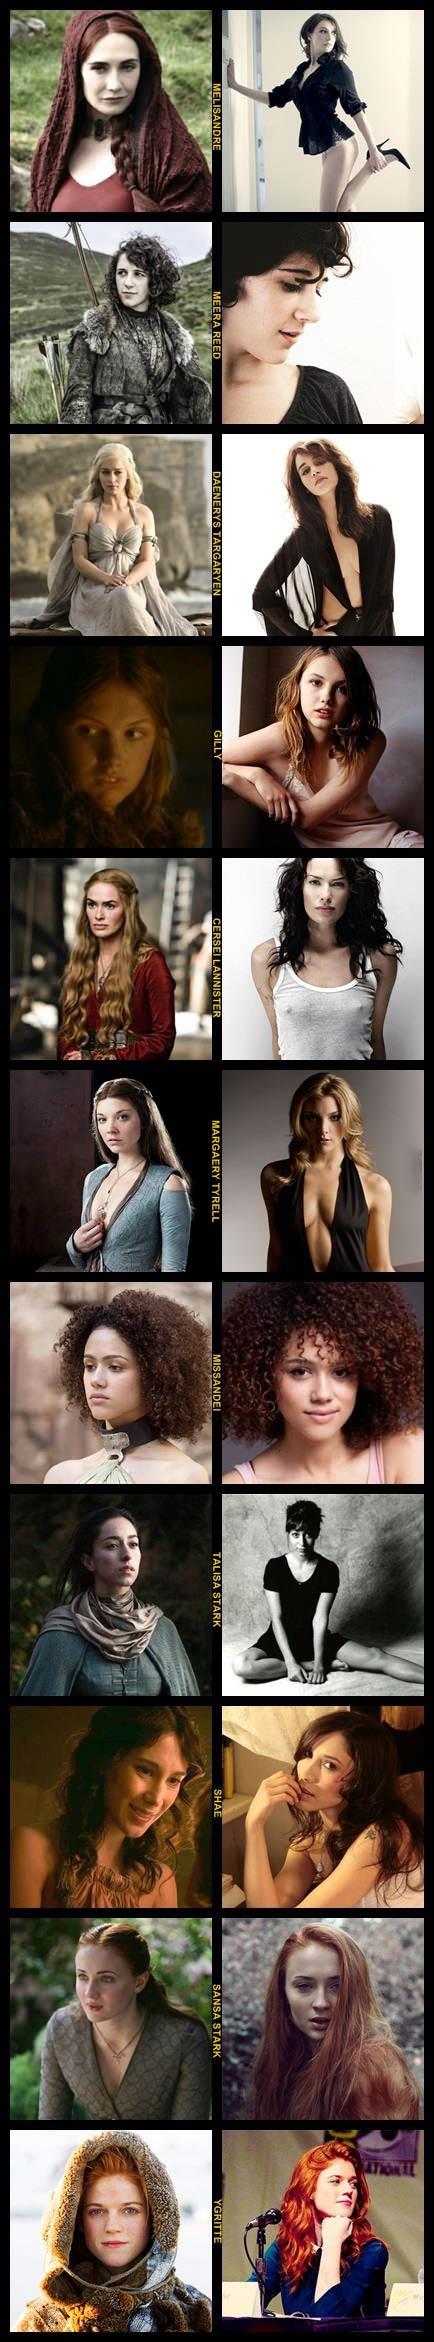 game of thrones, women, actresses